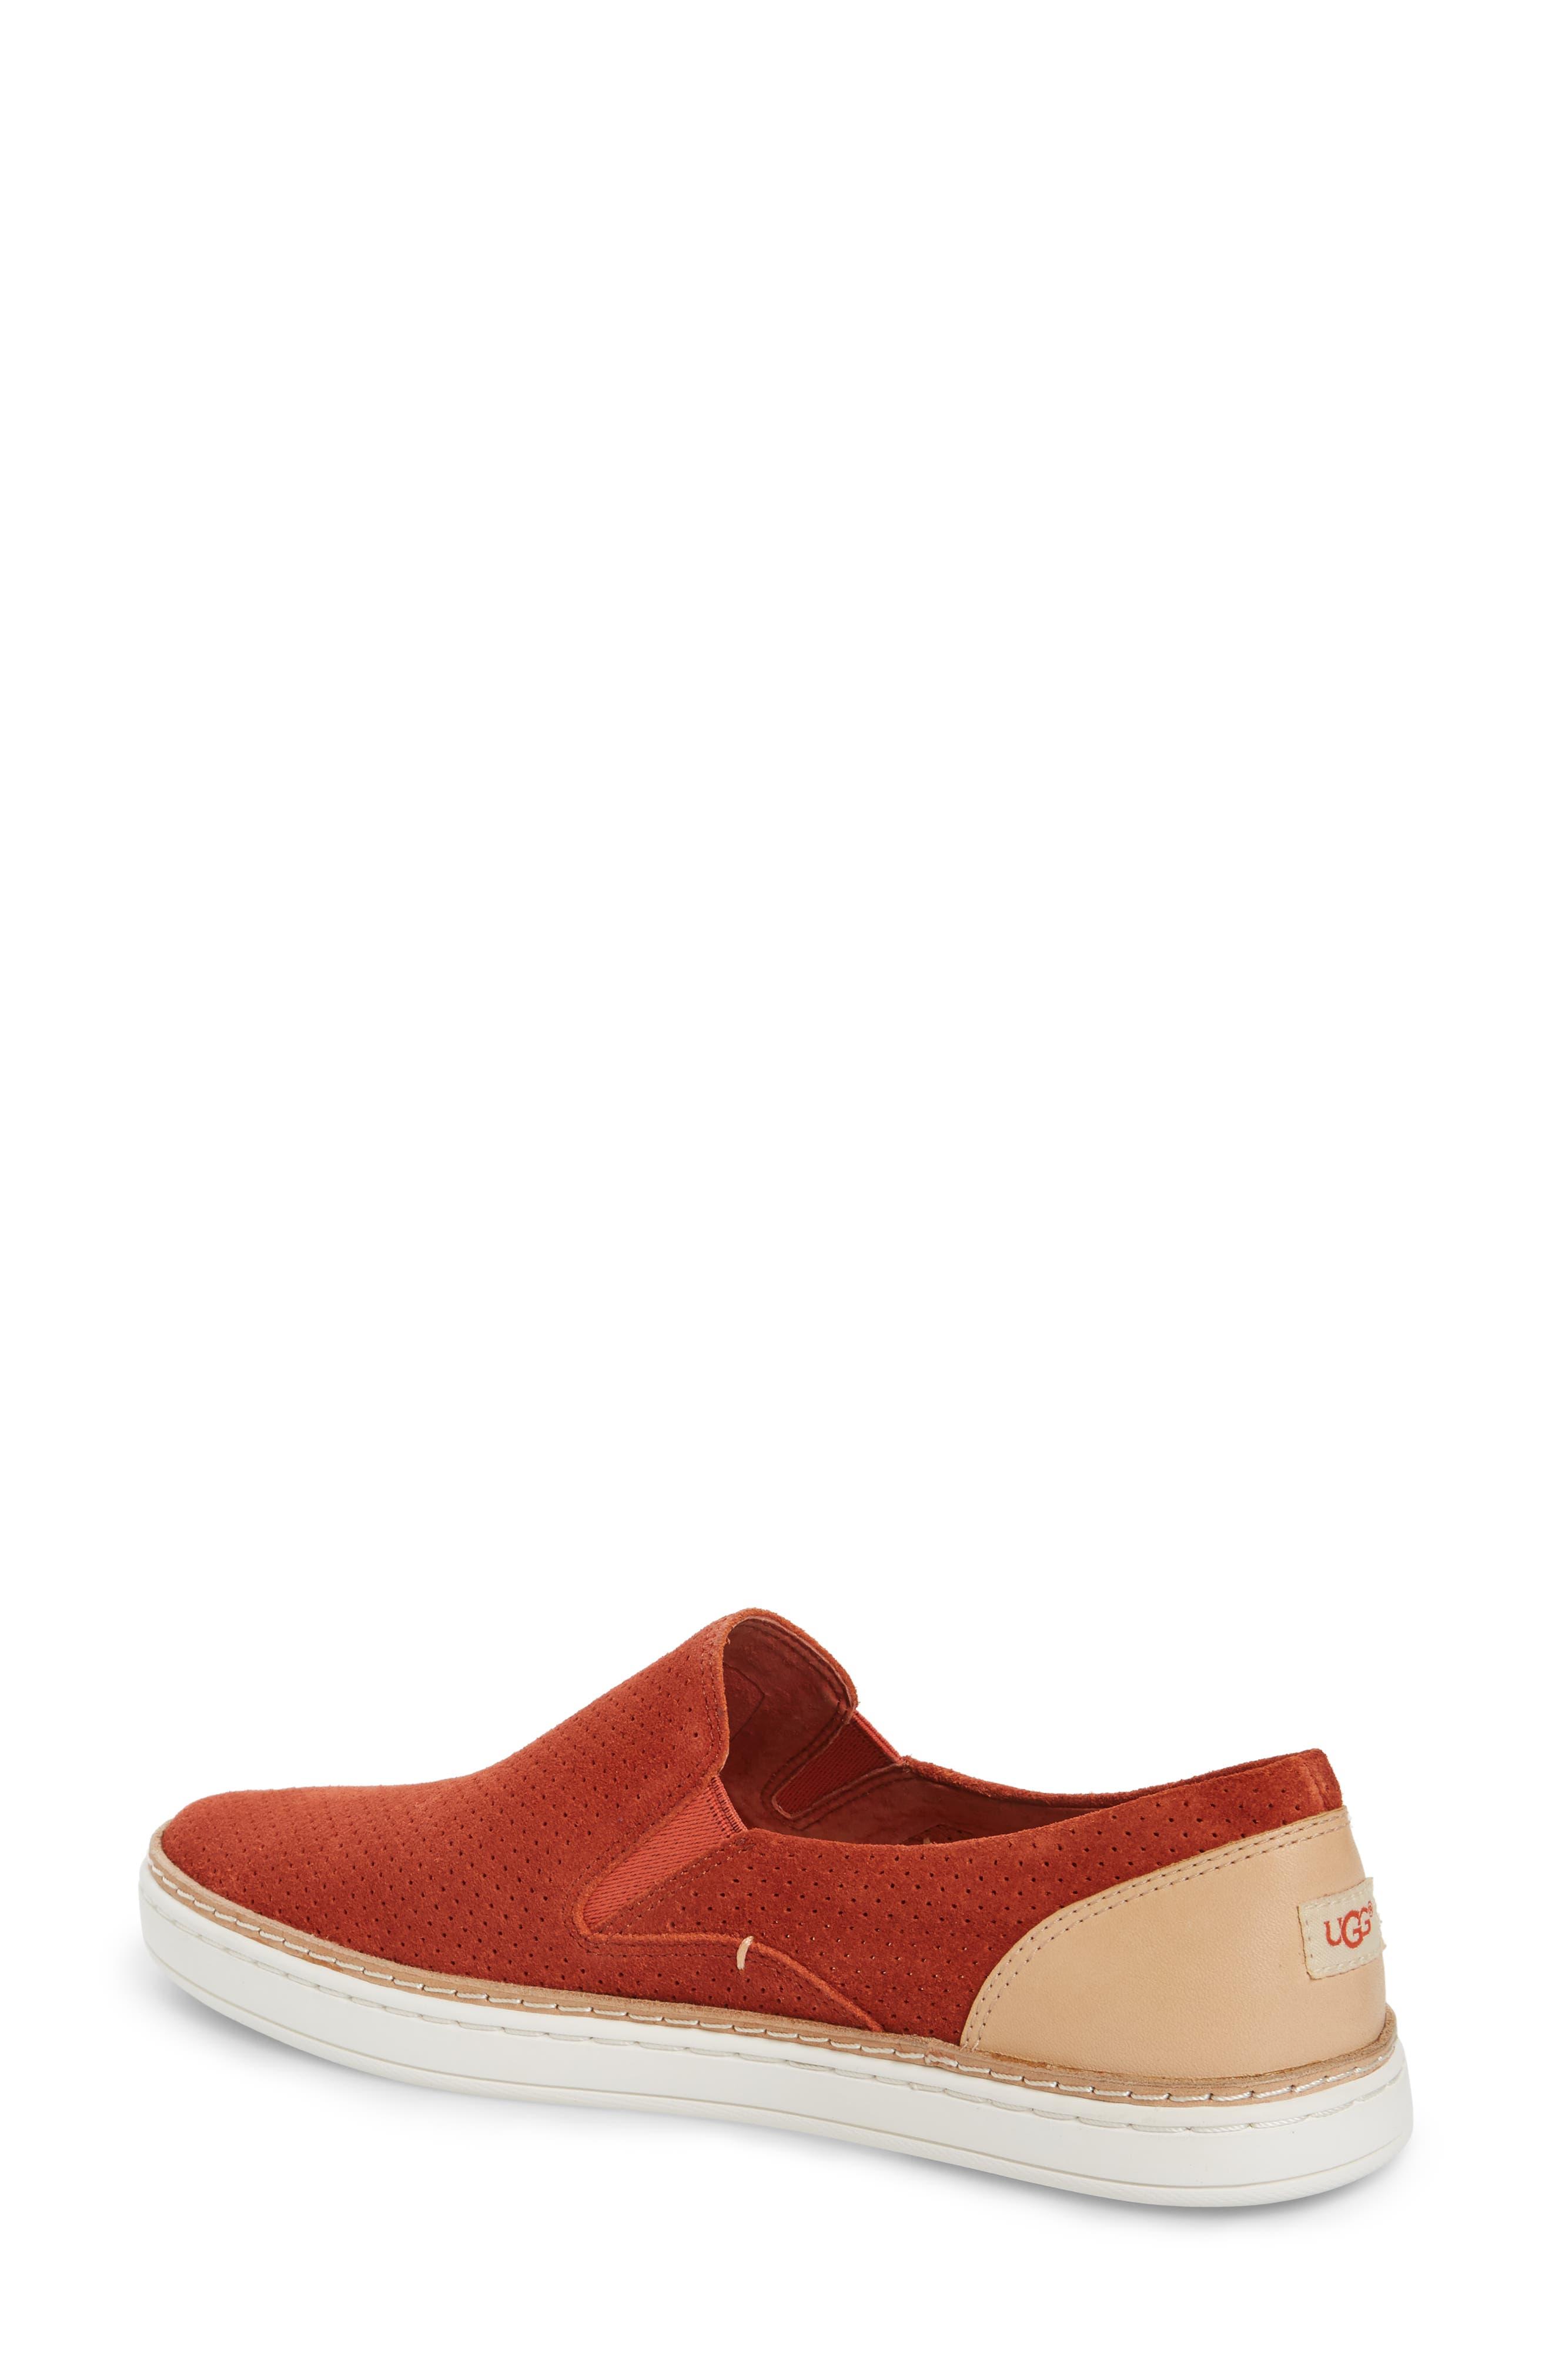 Adley Slip-On Sneaker,                             Alternate thumbnail 2, color,                             Paprika Suede